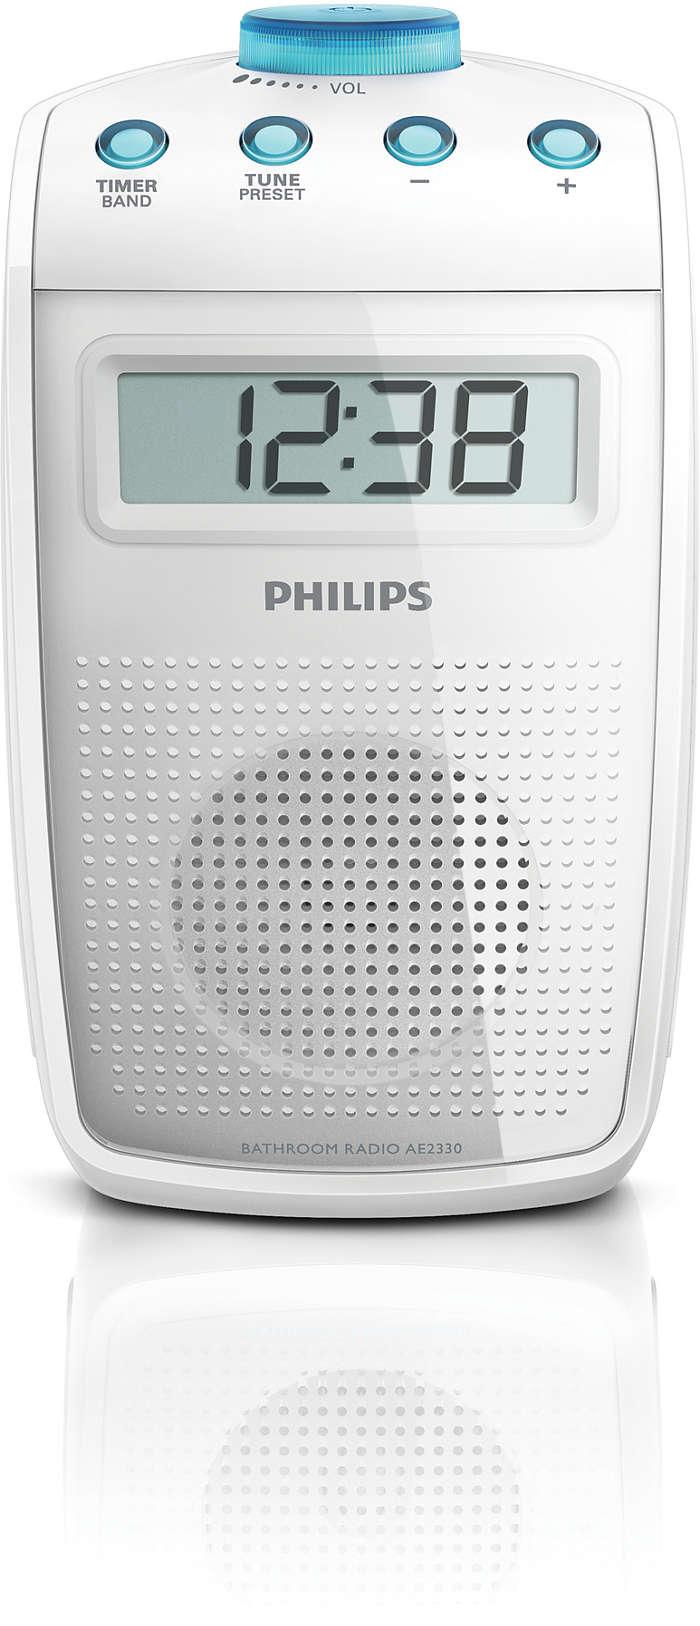 Bathroom Radio